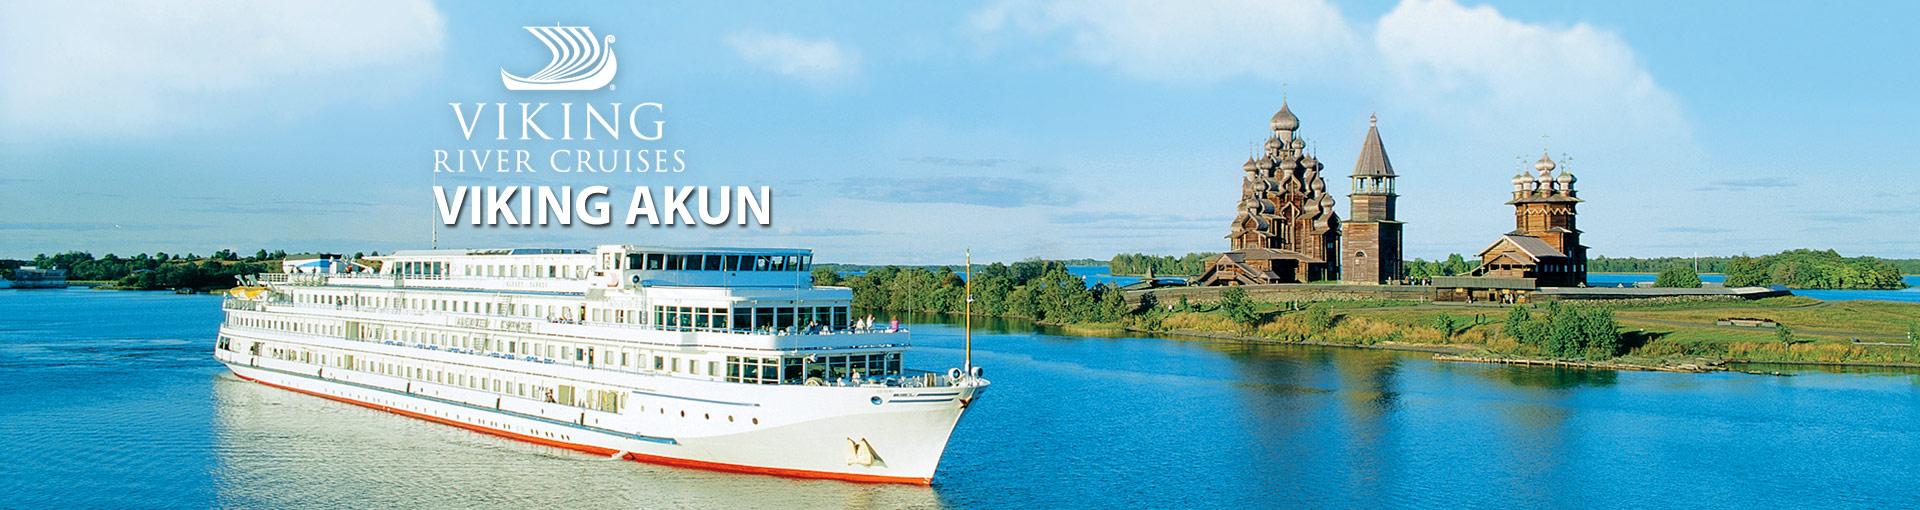 Viking Rivers Viking Akun river cruise ship